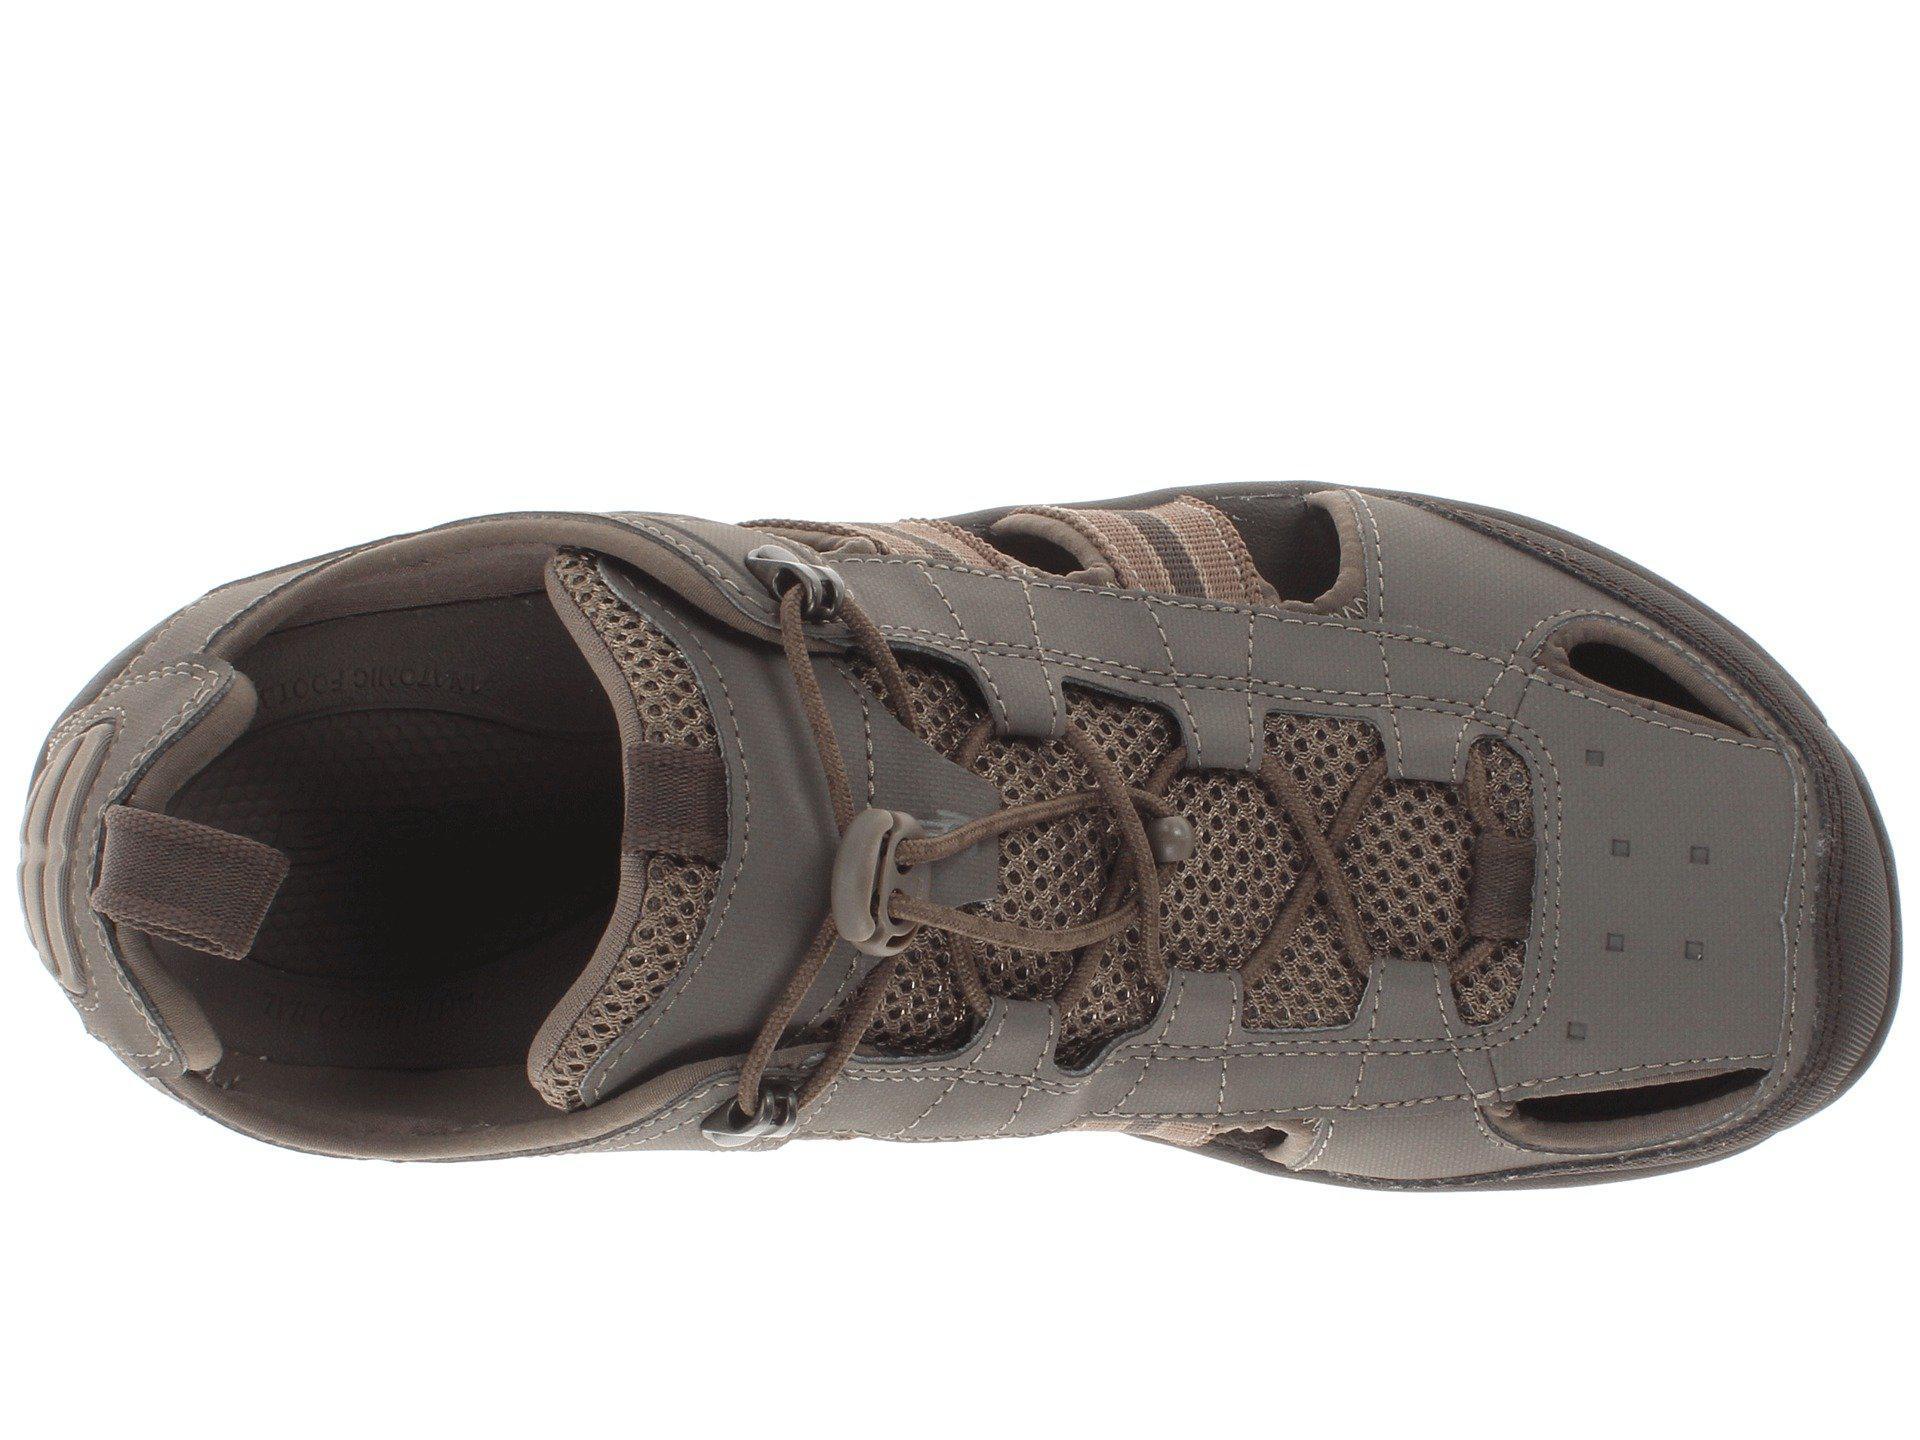 7eedb1c1bf59d Lyst - Teva Kimtah Sandal in Brown for Men